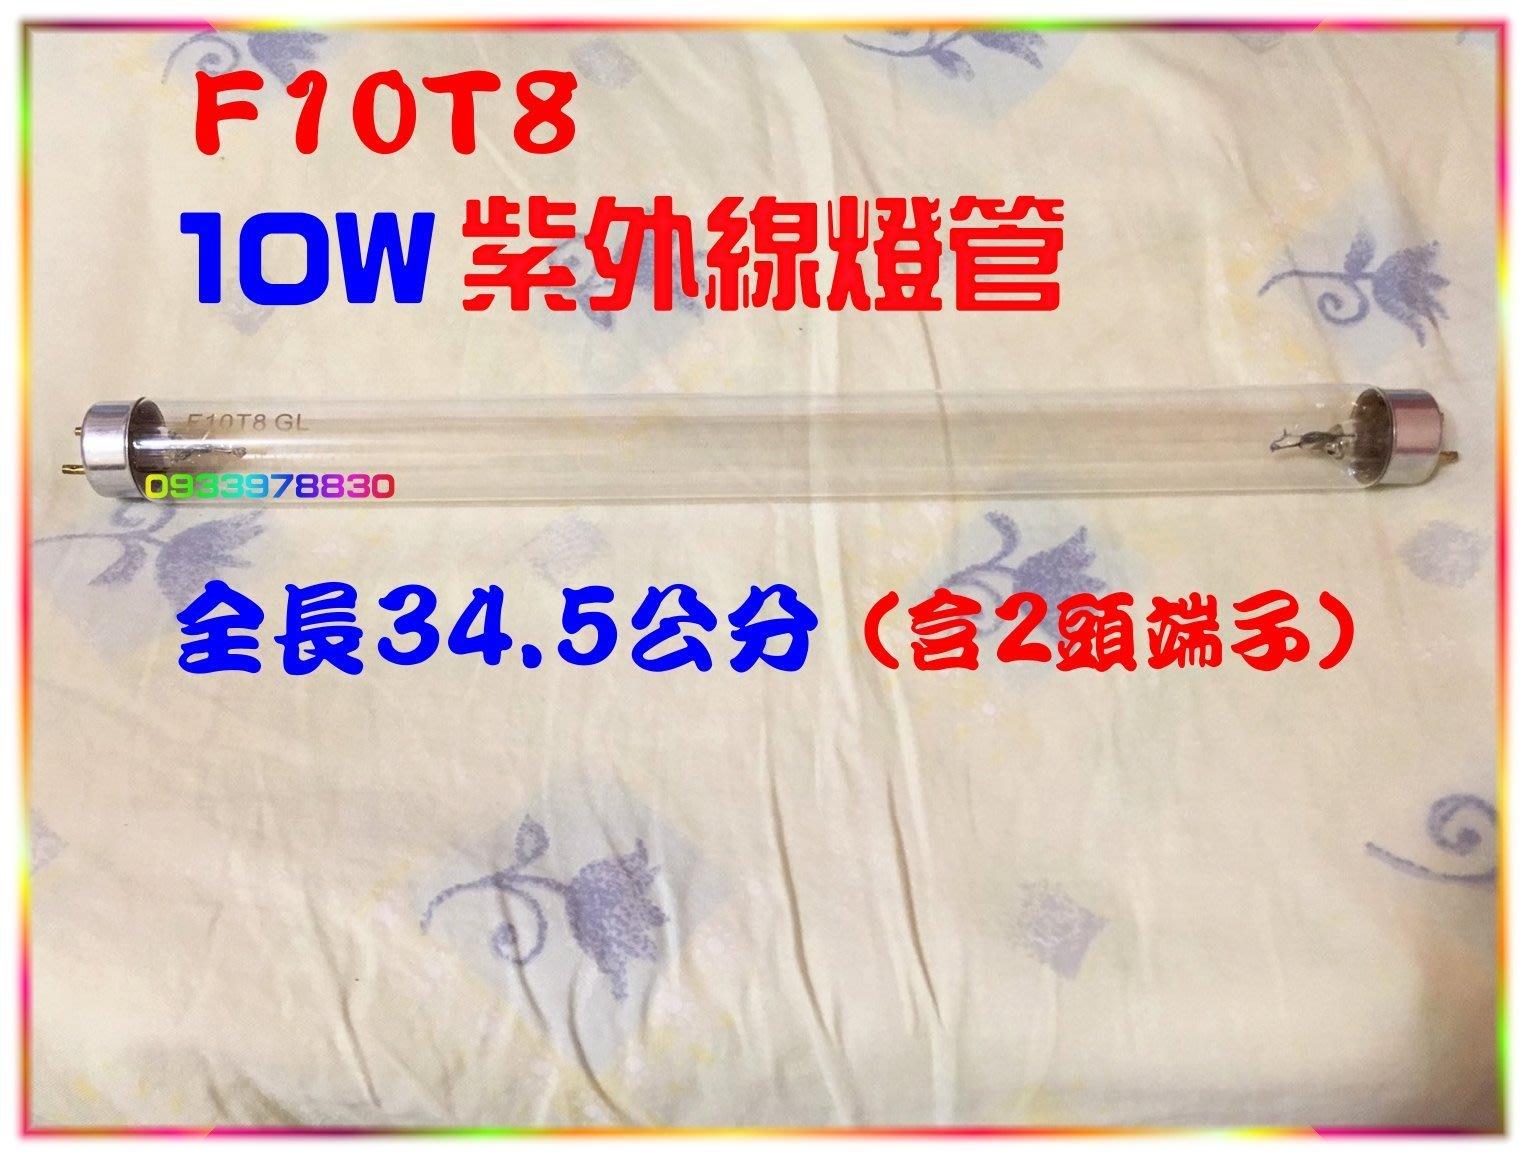 F10T8/GL☆10W紫外線燈管 (紫外線烘碗機專用) ~烘碗機燈管~超低價(全長34.5公分